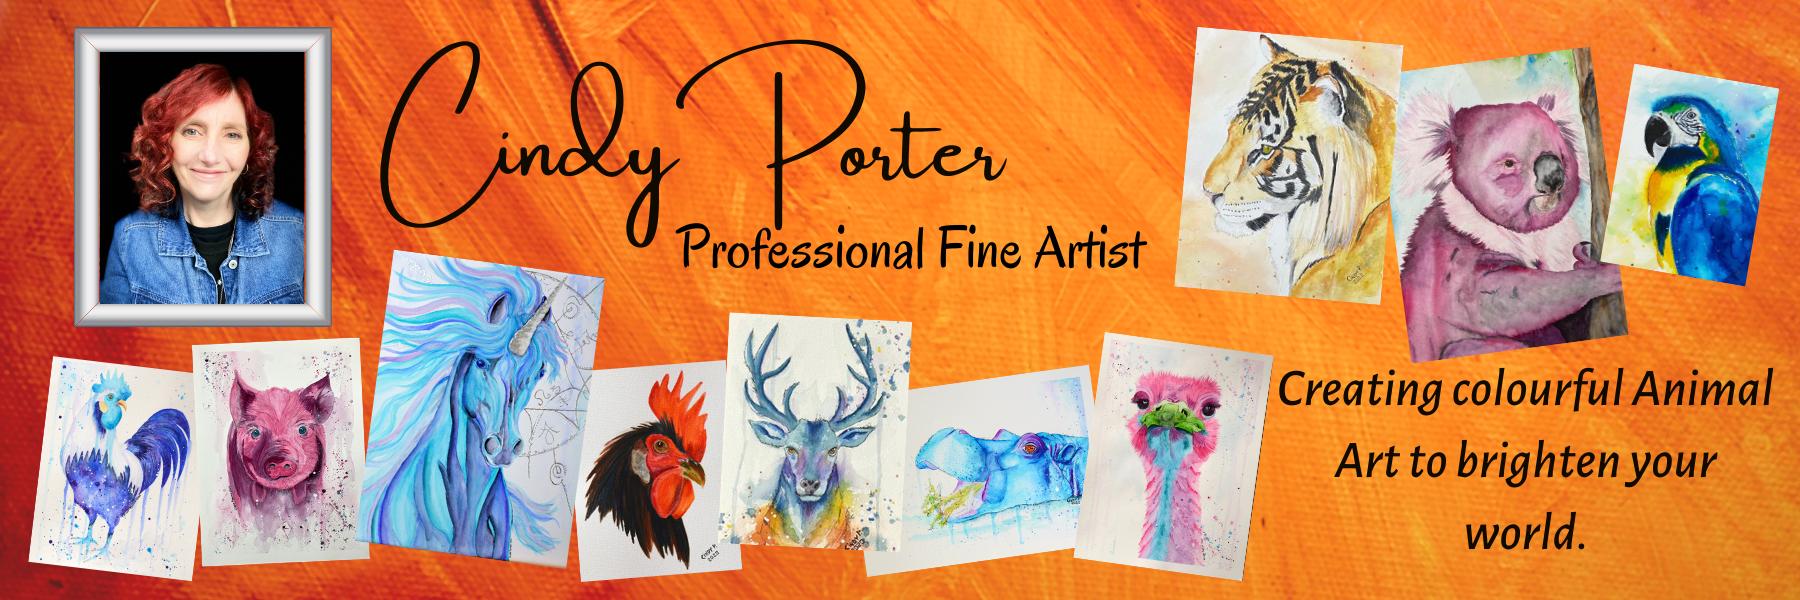 Cindy Porter Artist